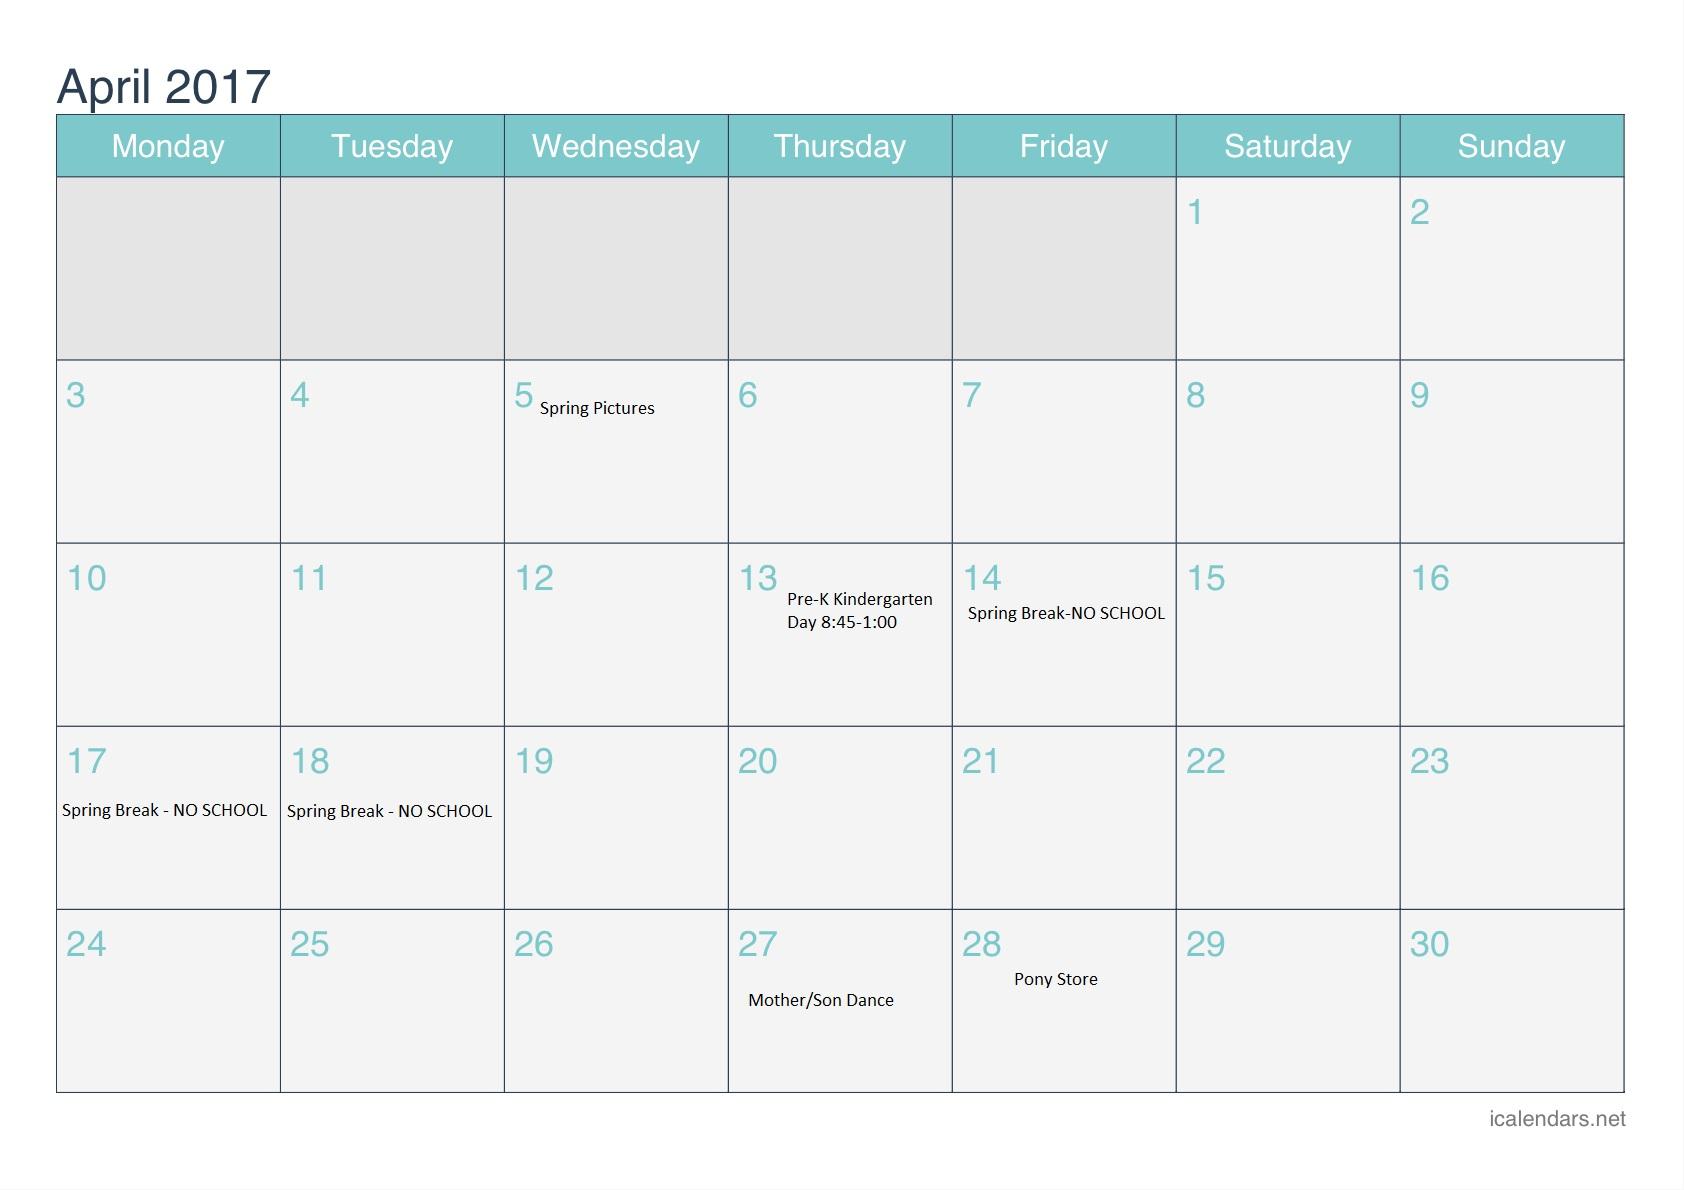 Calendar Kannada Pdf : South fork school district calendar elementary